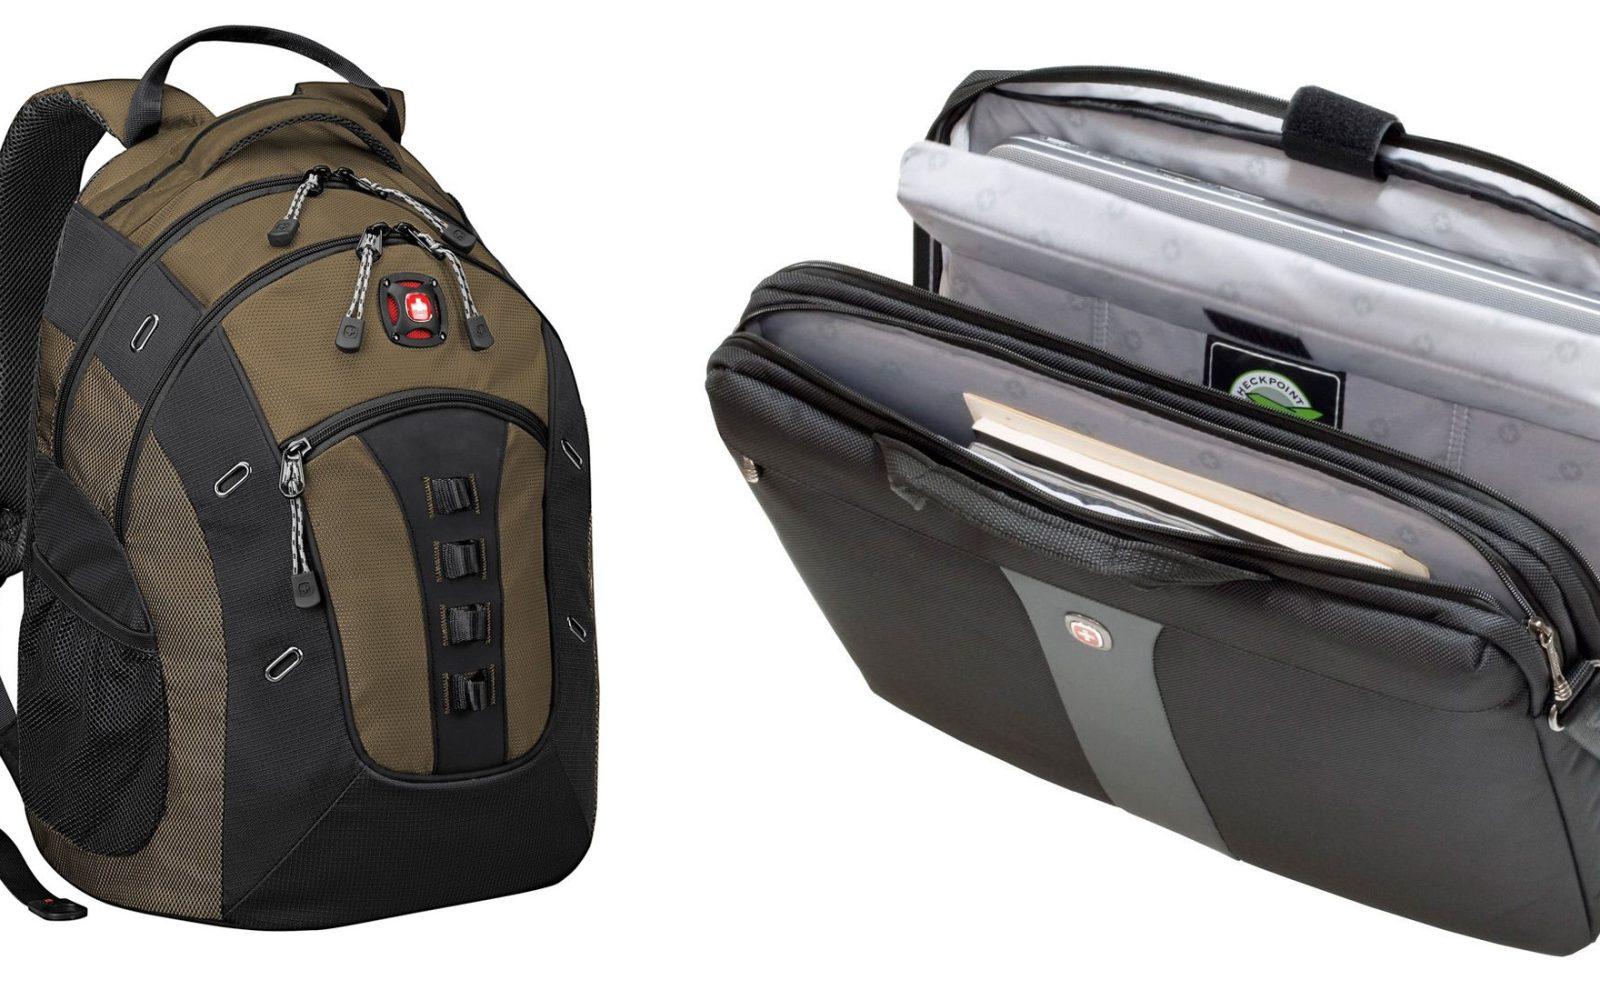 Swissgear Granite Deluxe Laptop Backpack Multiple Colors